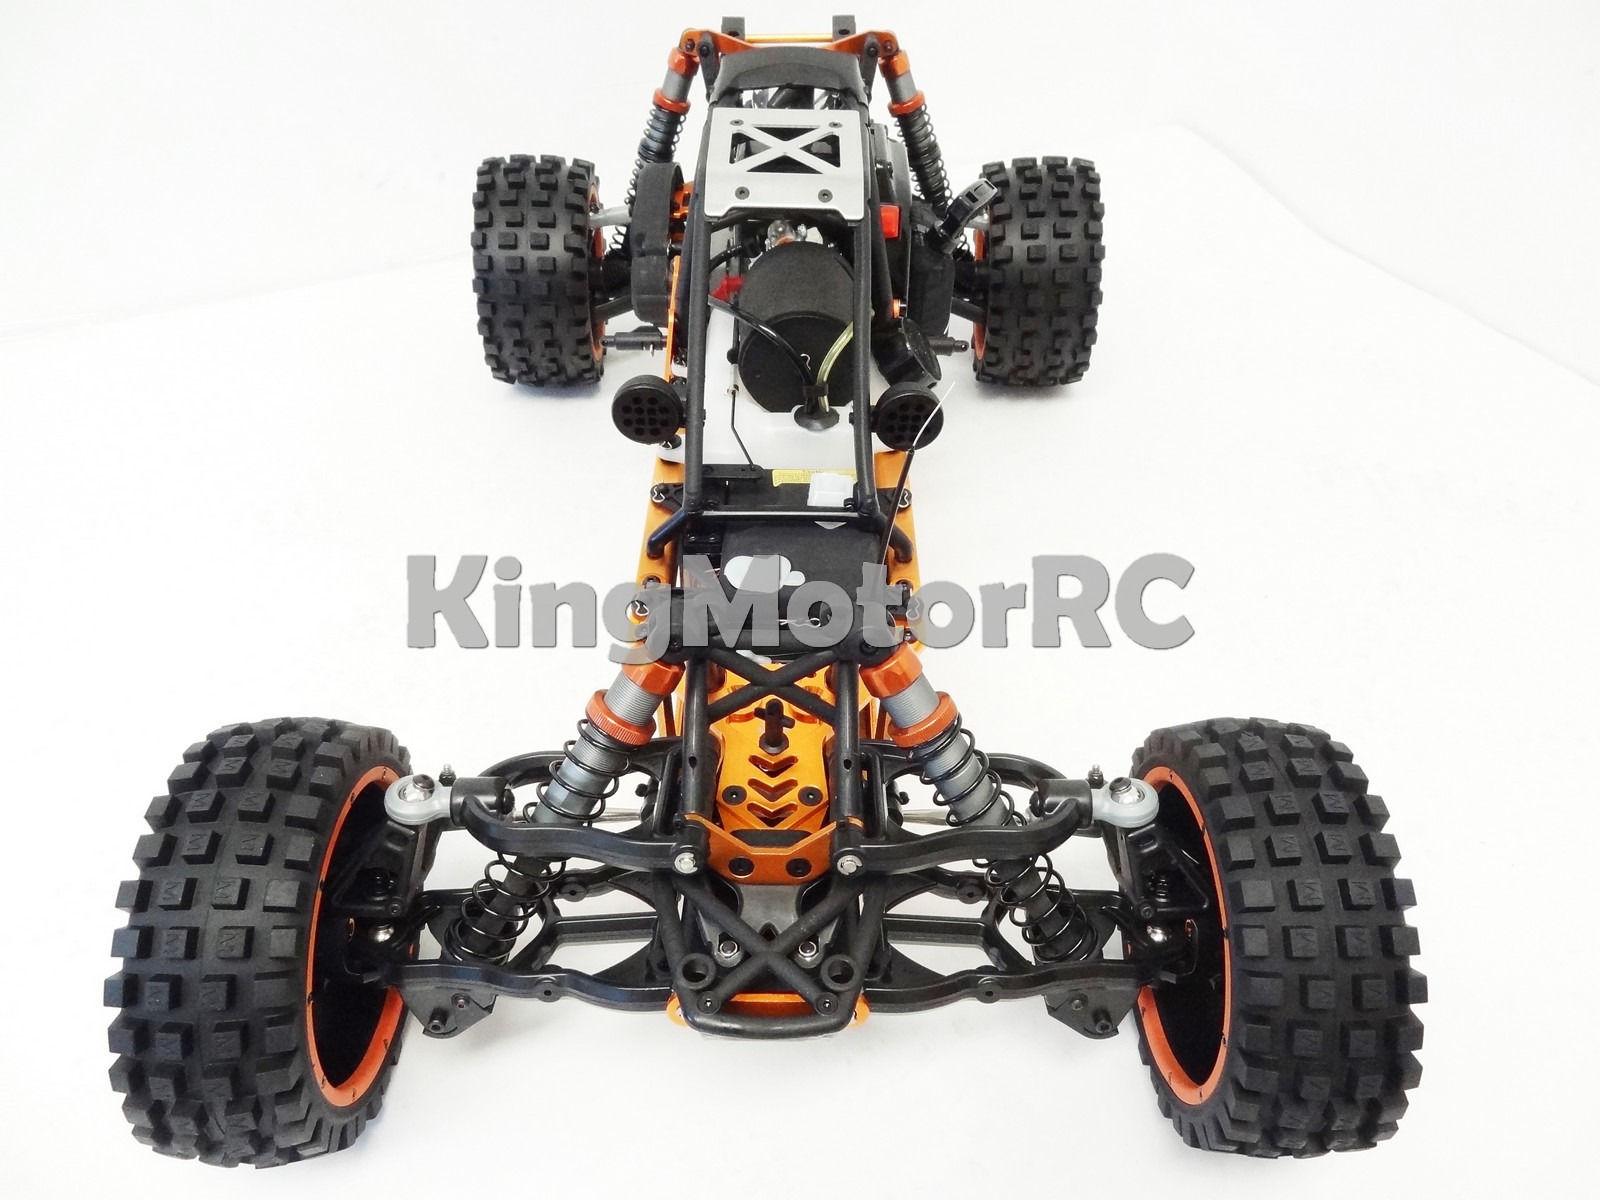 Axle boot dogbone for hpi rovan kingmotor baja 5B 5T 5SC buggy truck